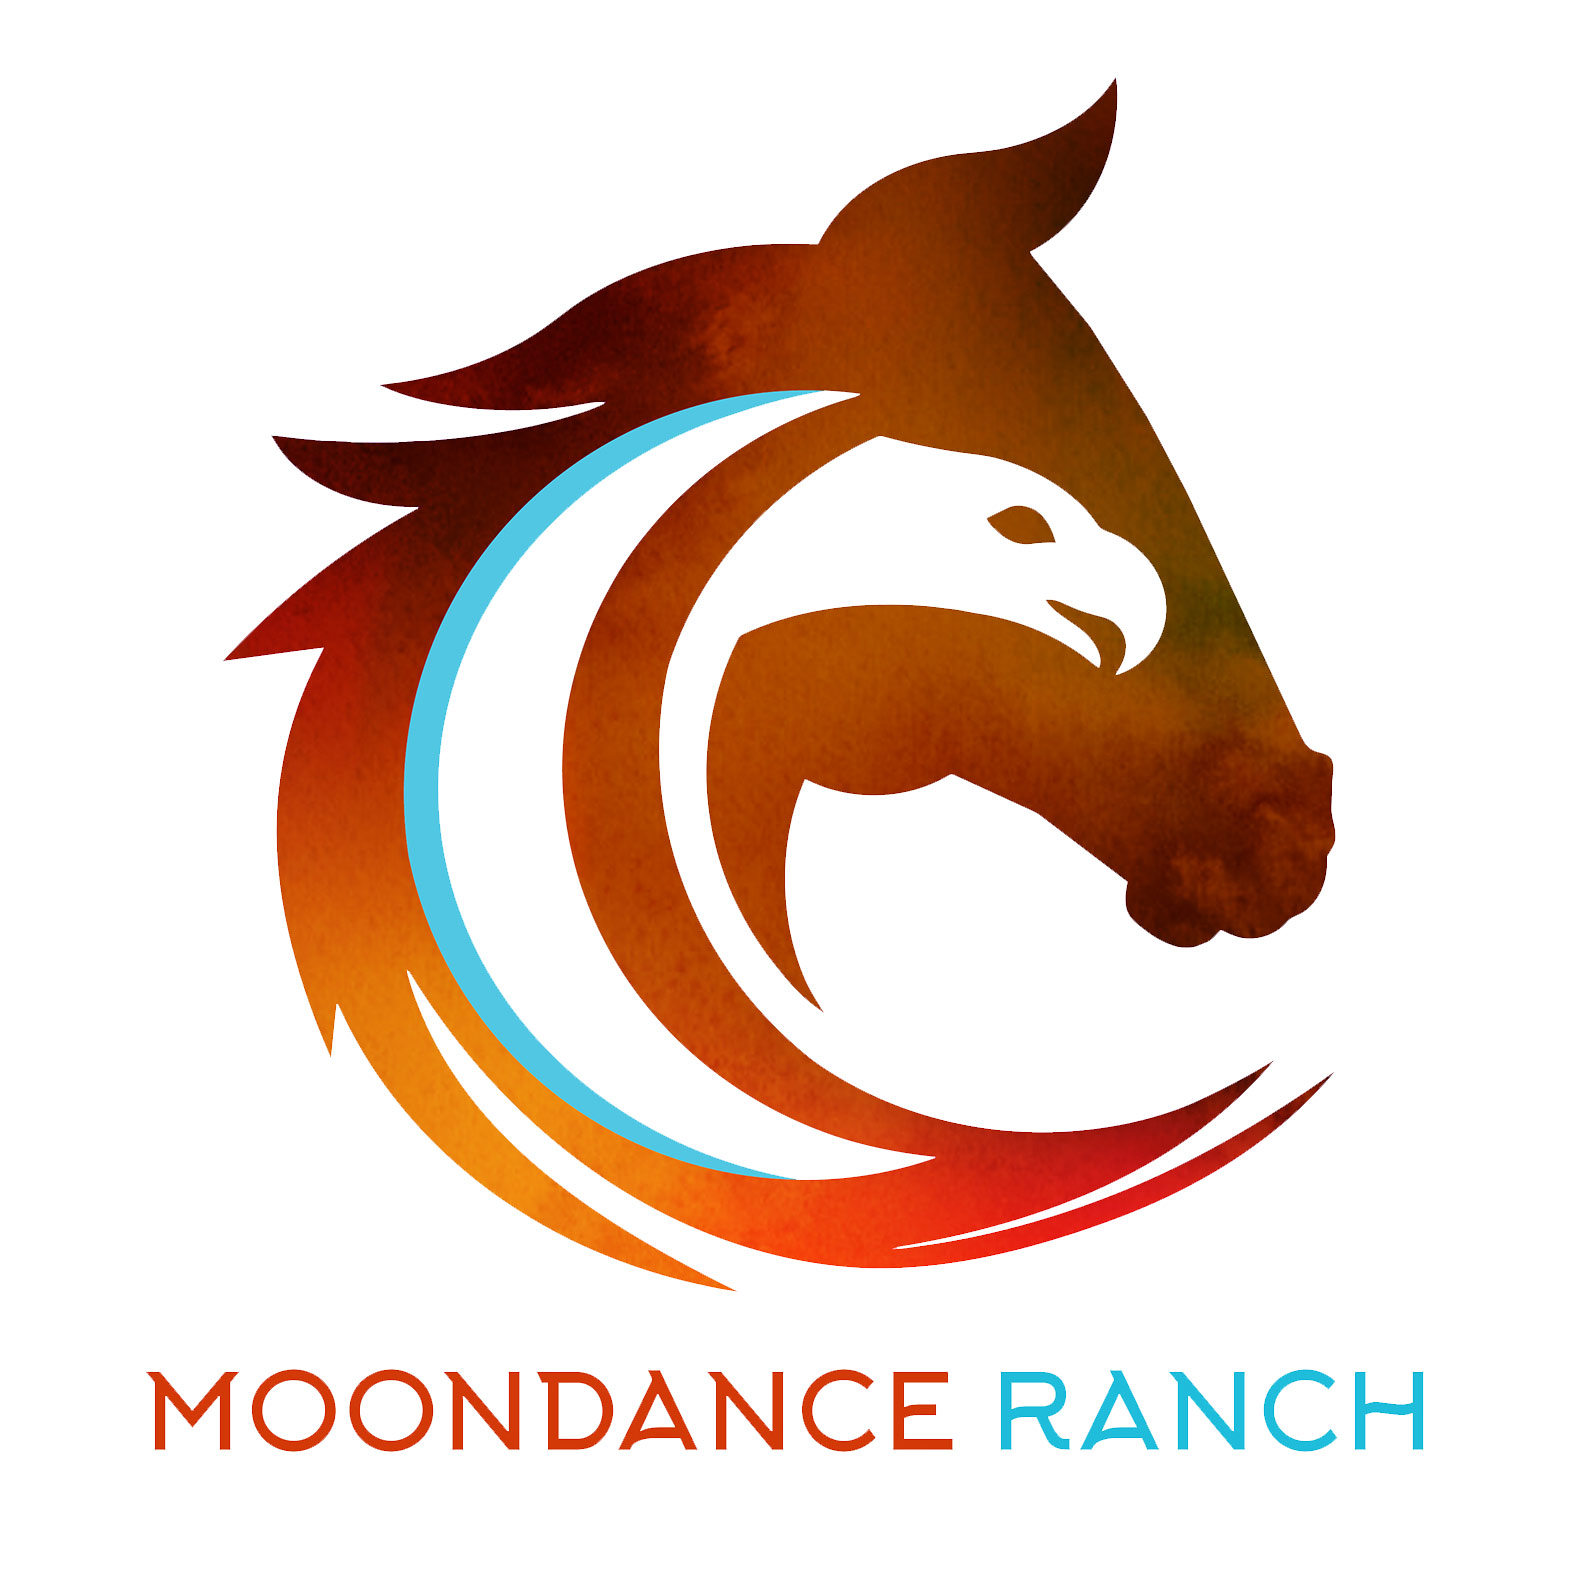 MOONDANCE RANCH